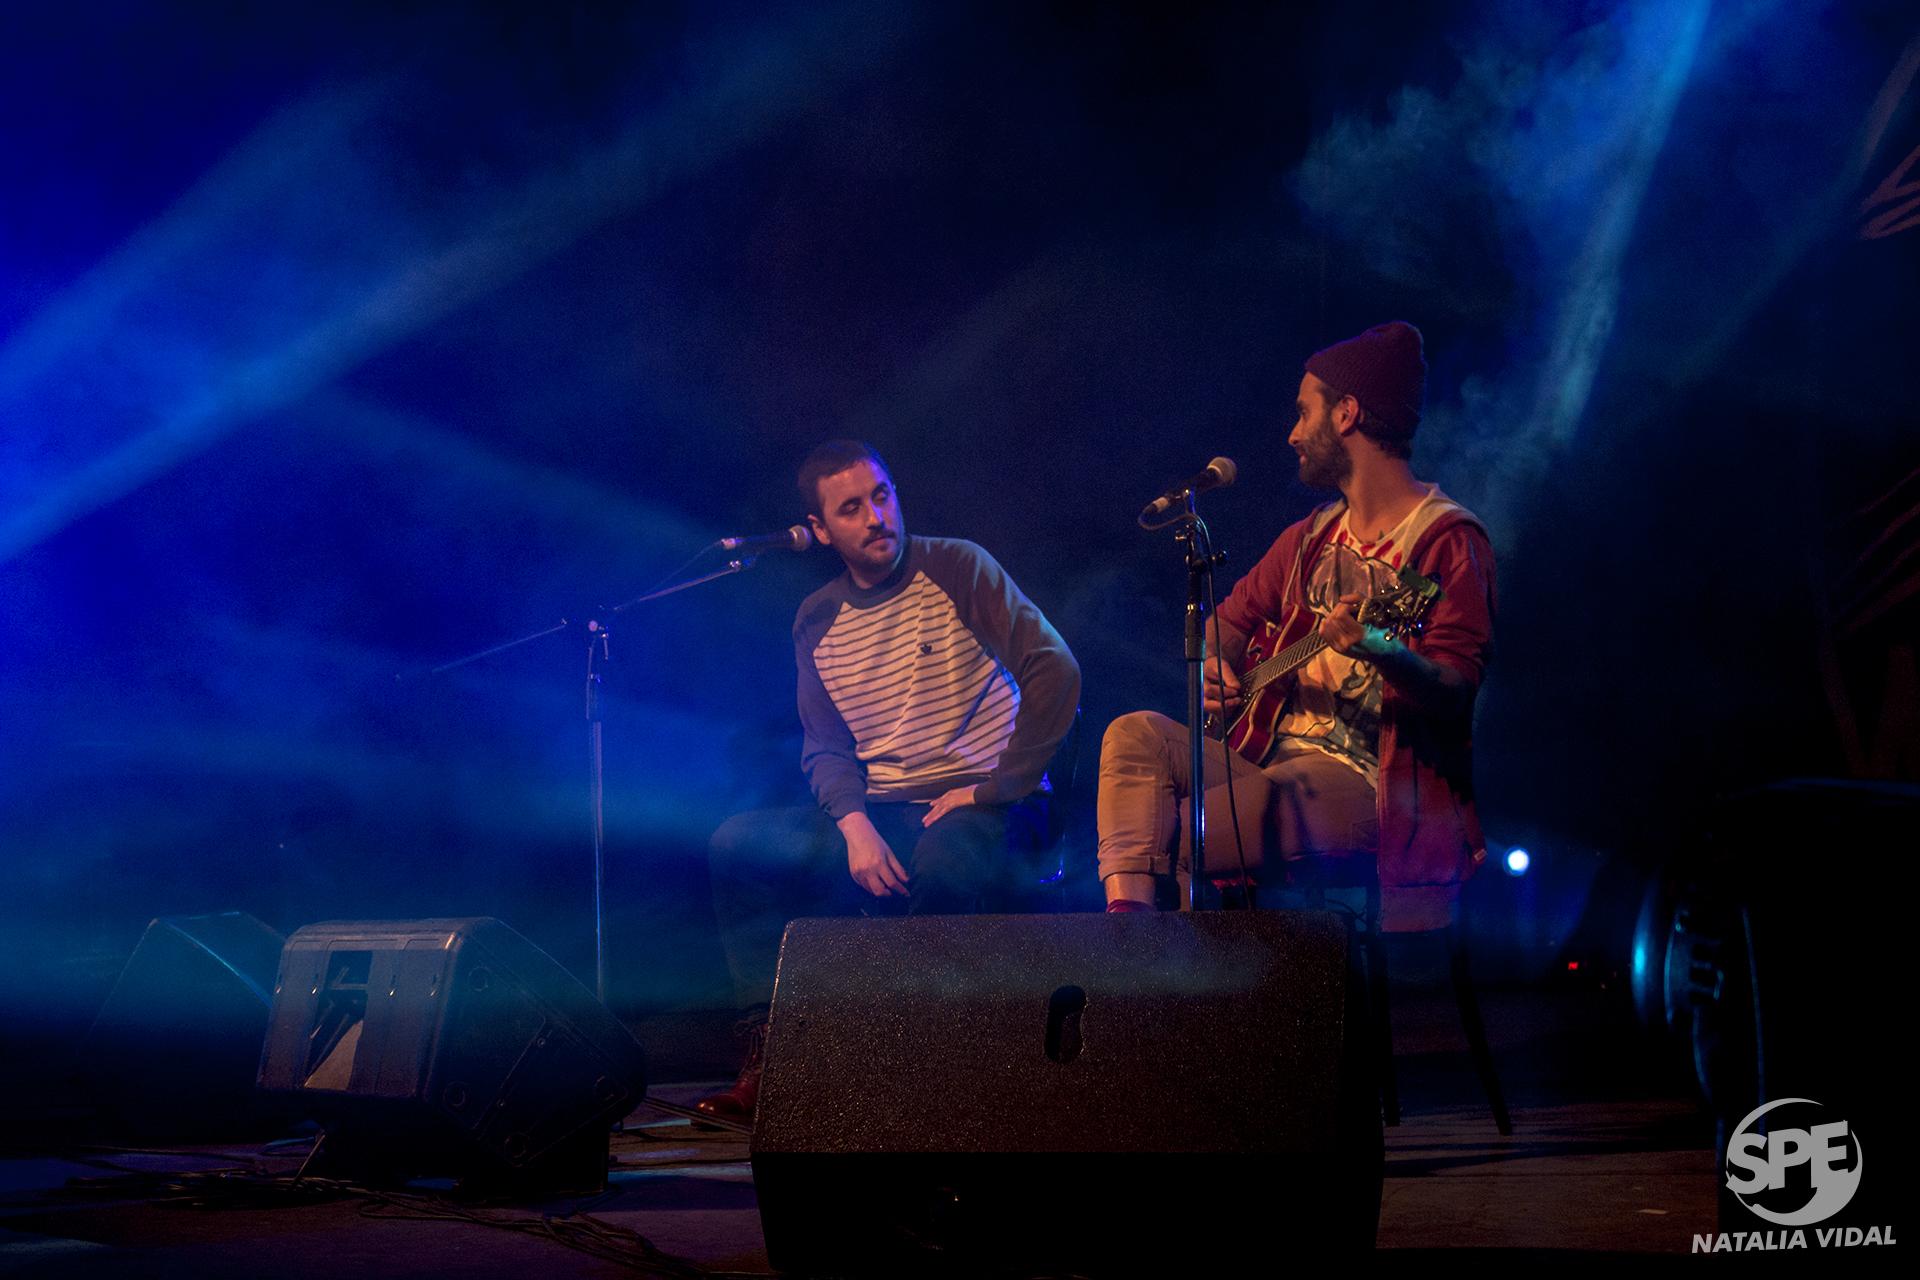 Mi-Amigo-Invencible-Festi-Mercurio-Teatro-Xirgu-30-06-18-Natalia-Vidal-Solo-Para-Entendidos_480.jpg